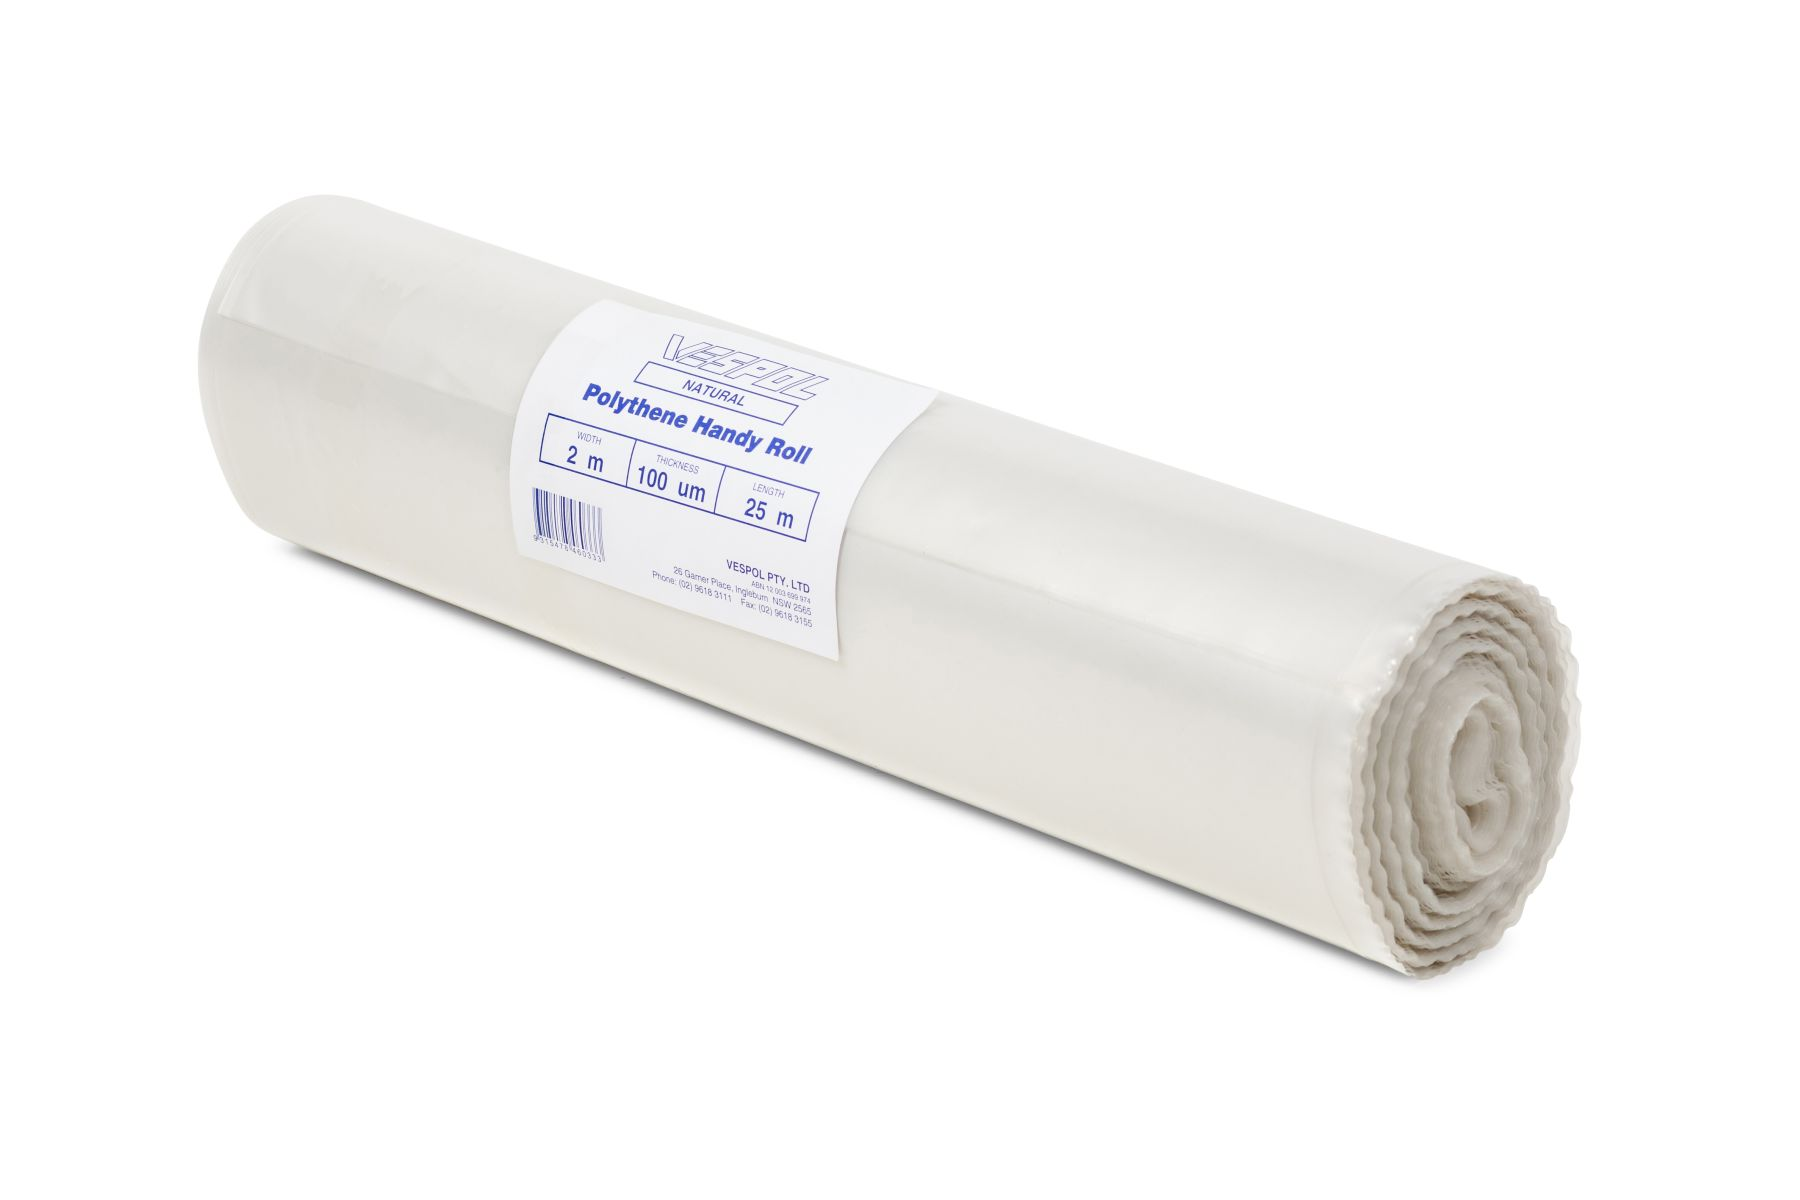 Vespol Film Polythene Handy Roll Natural 2x5m 100um